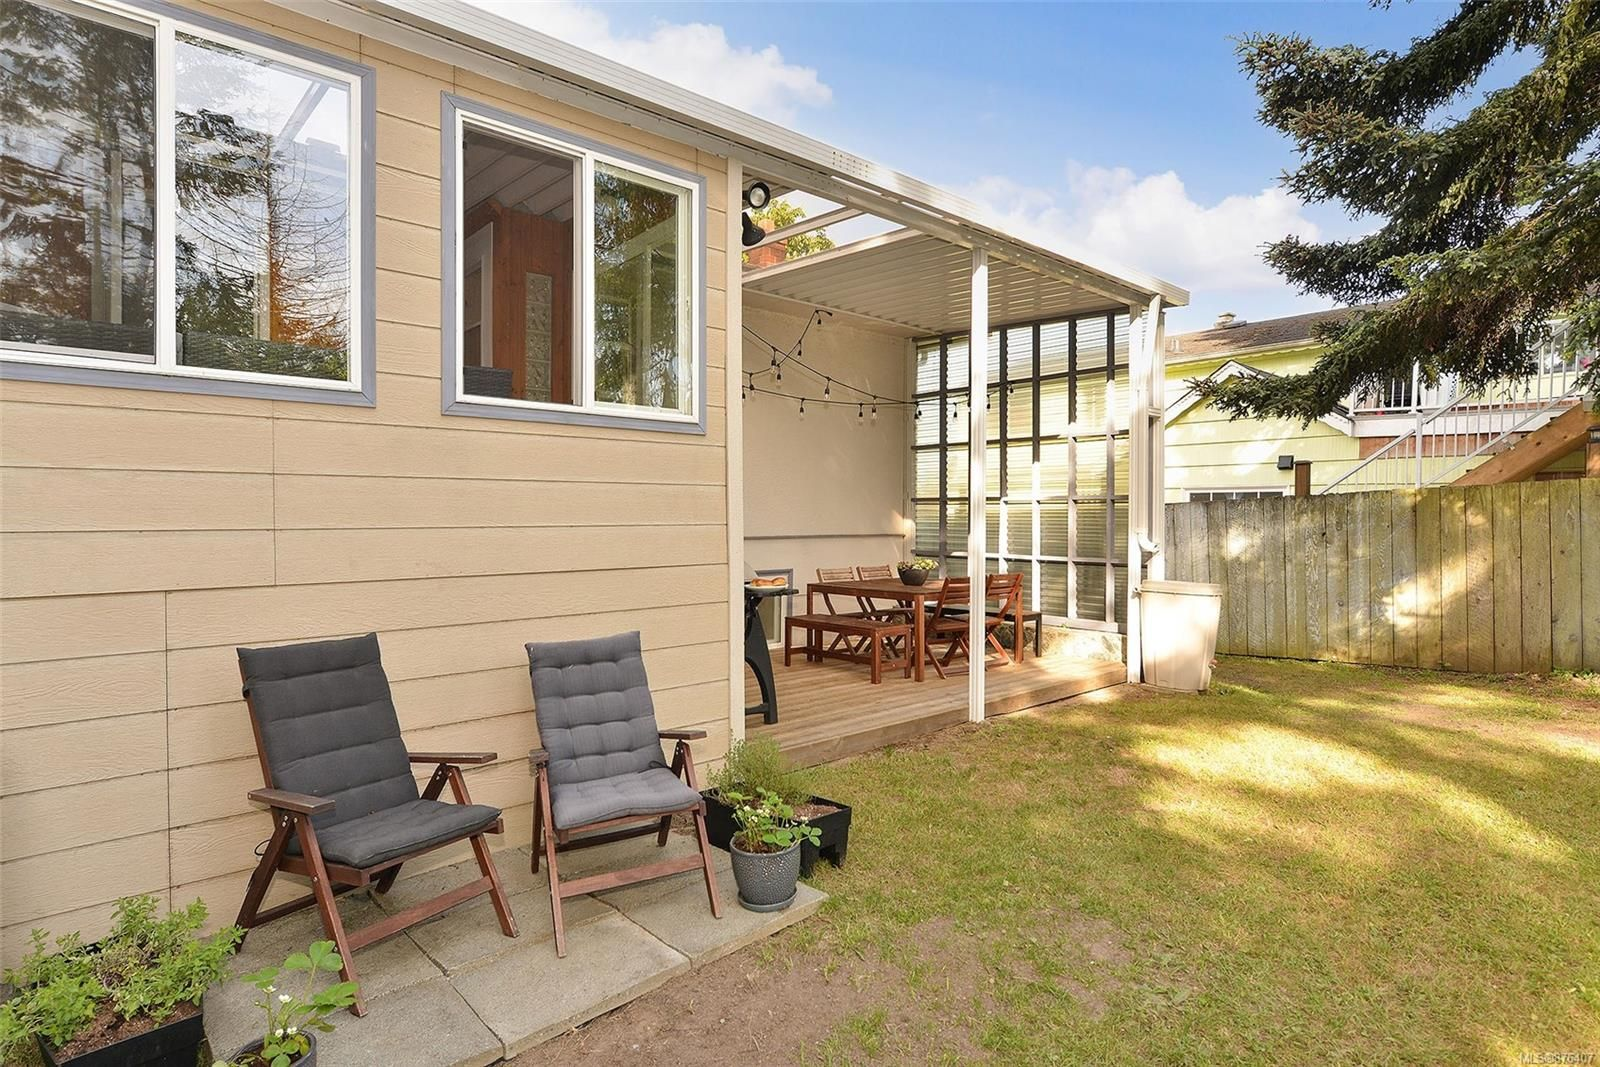 Photo 6: Photos: 631 Cowper St in Saanich: SW Gorge House for sale (Saanich West)  : MLS®# 876407